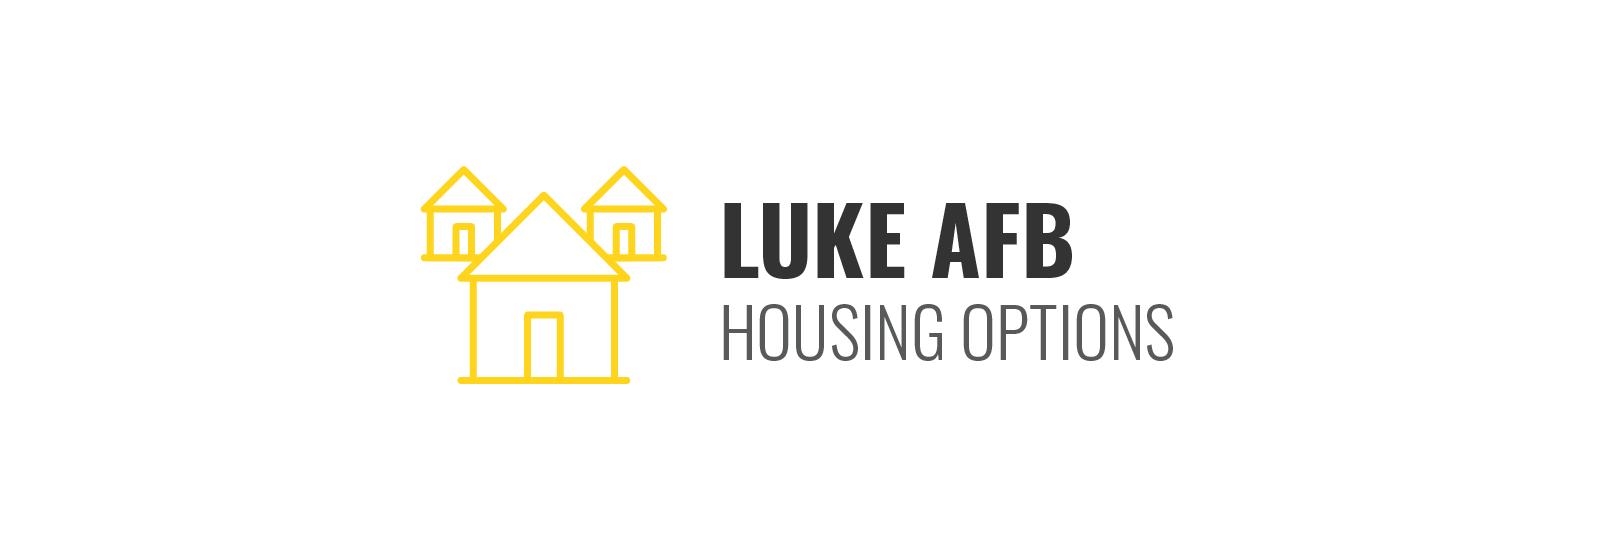 Luke AFB Housing Options